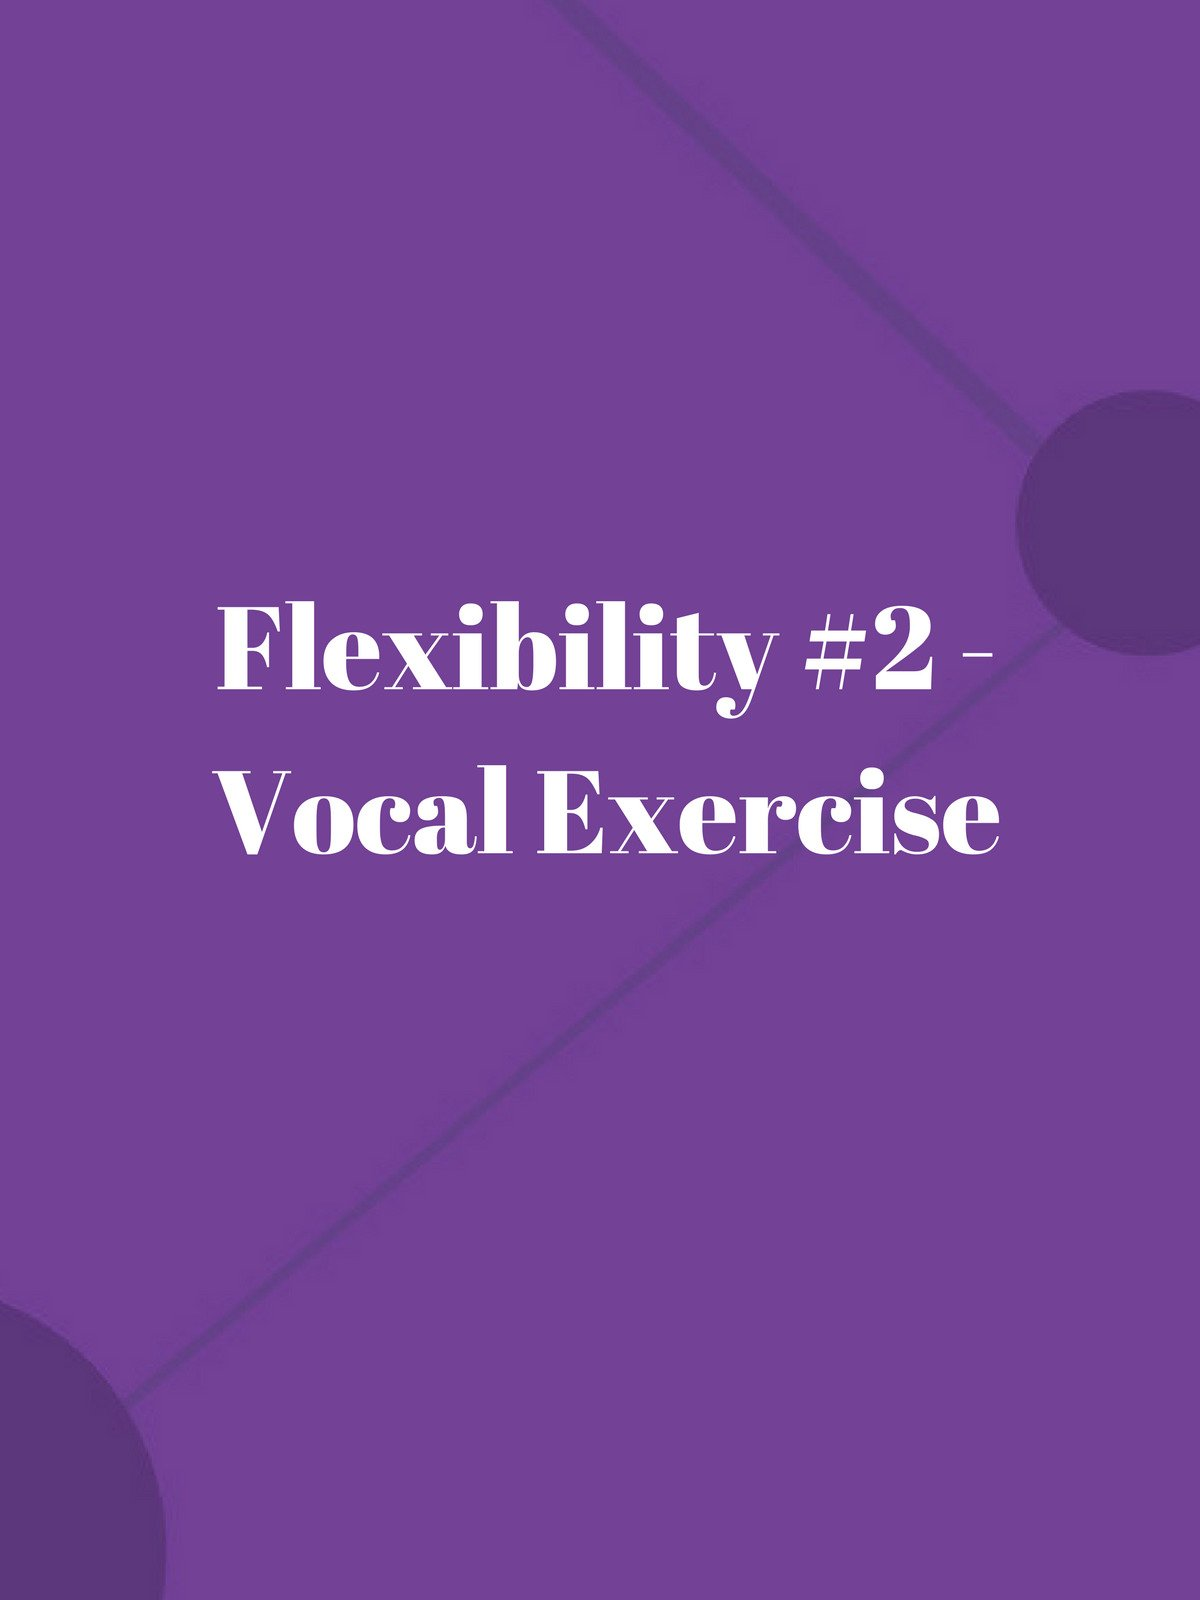 Flexibility #2